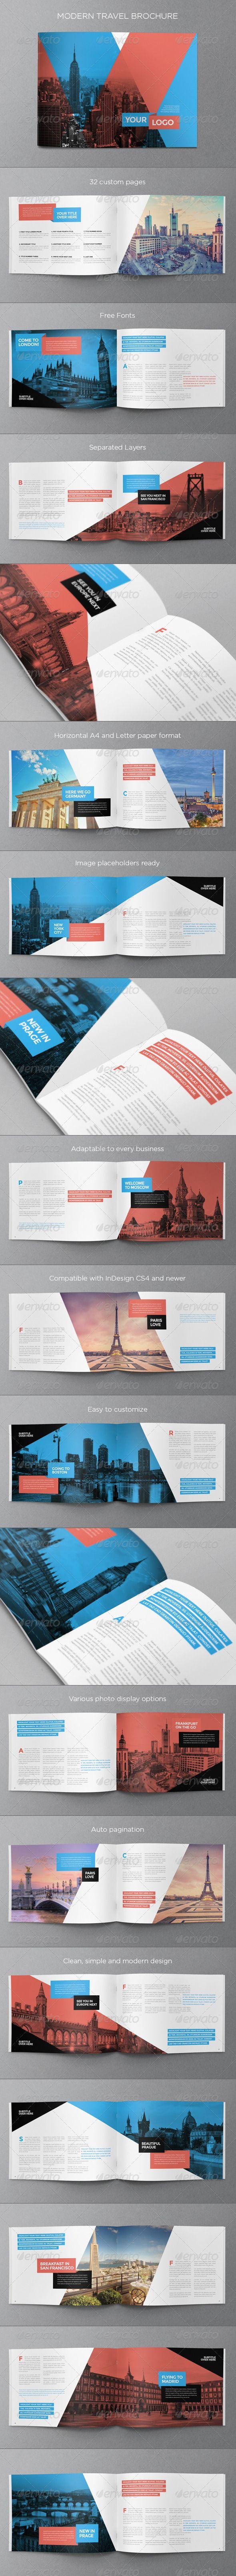 Modern Travel Brochure - Brochures Print Templates